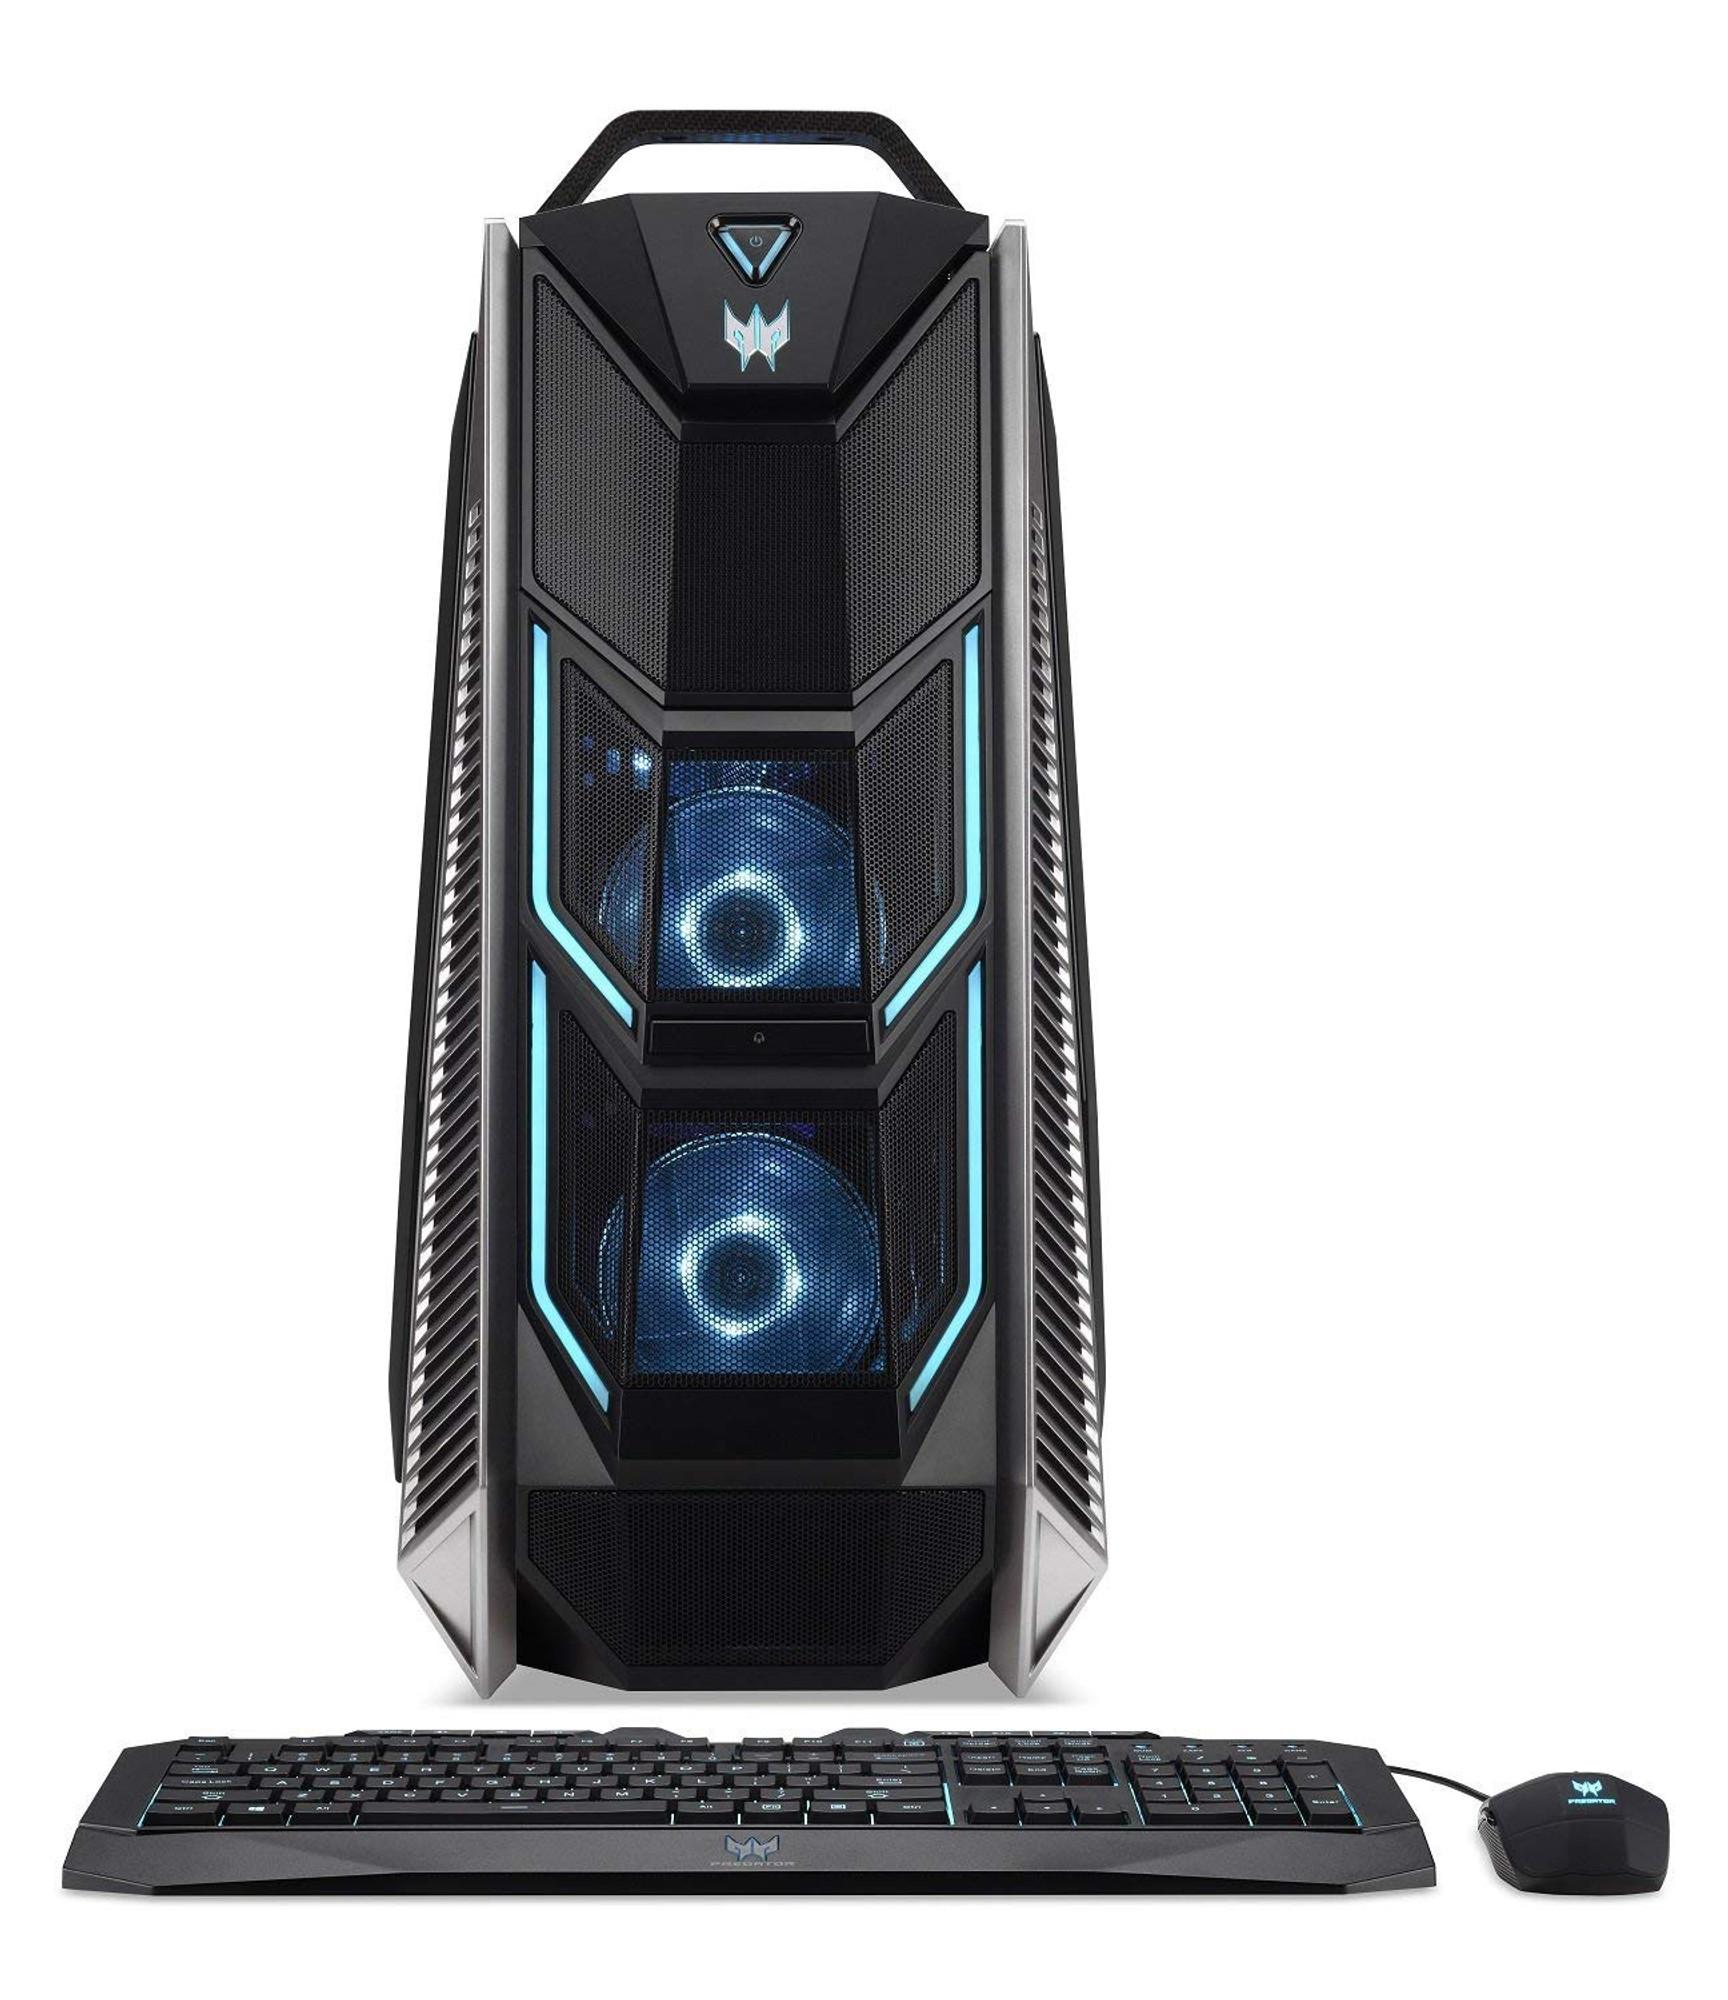 Acer Predator Orion 9000 PC Core i7-8700K 3 7GHz 32GB Ram 2TB HDD 256GB SSD  Windows 10 Home | PO9-600-I7KDCE